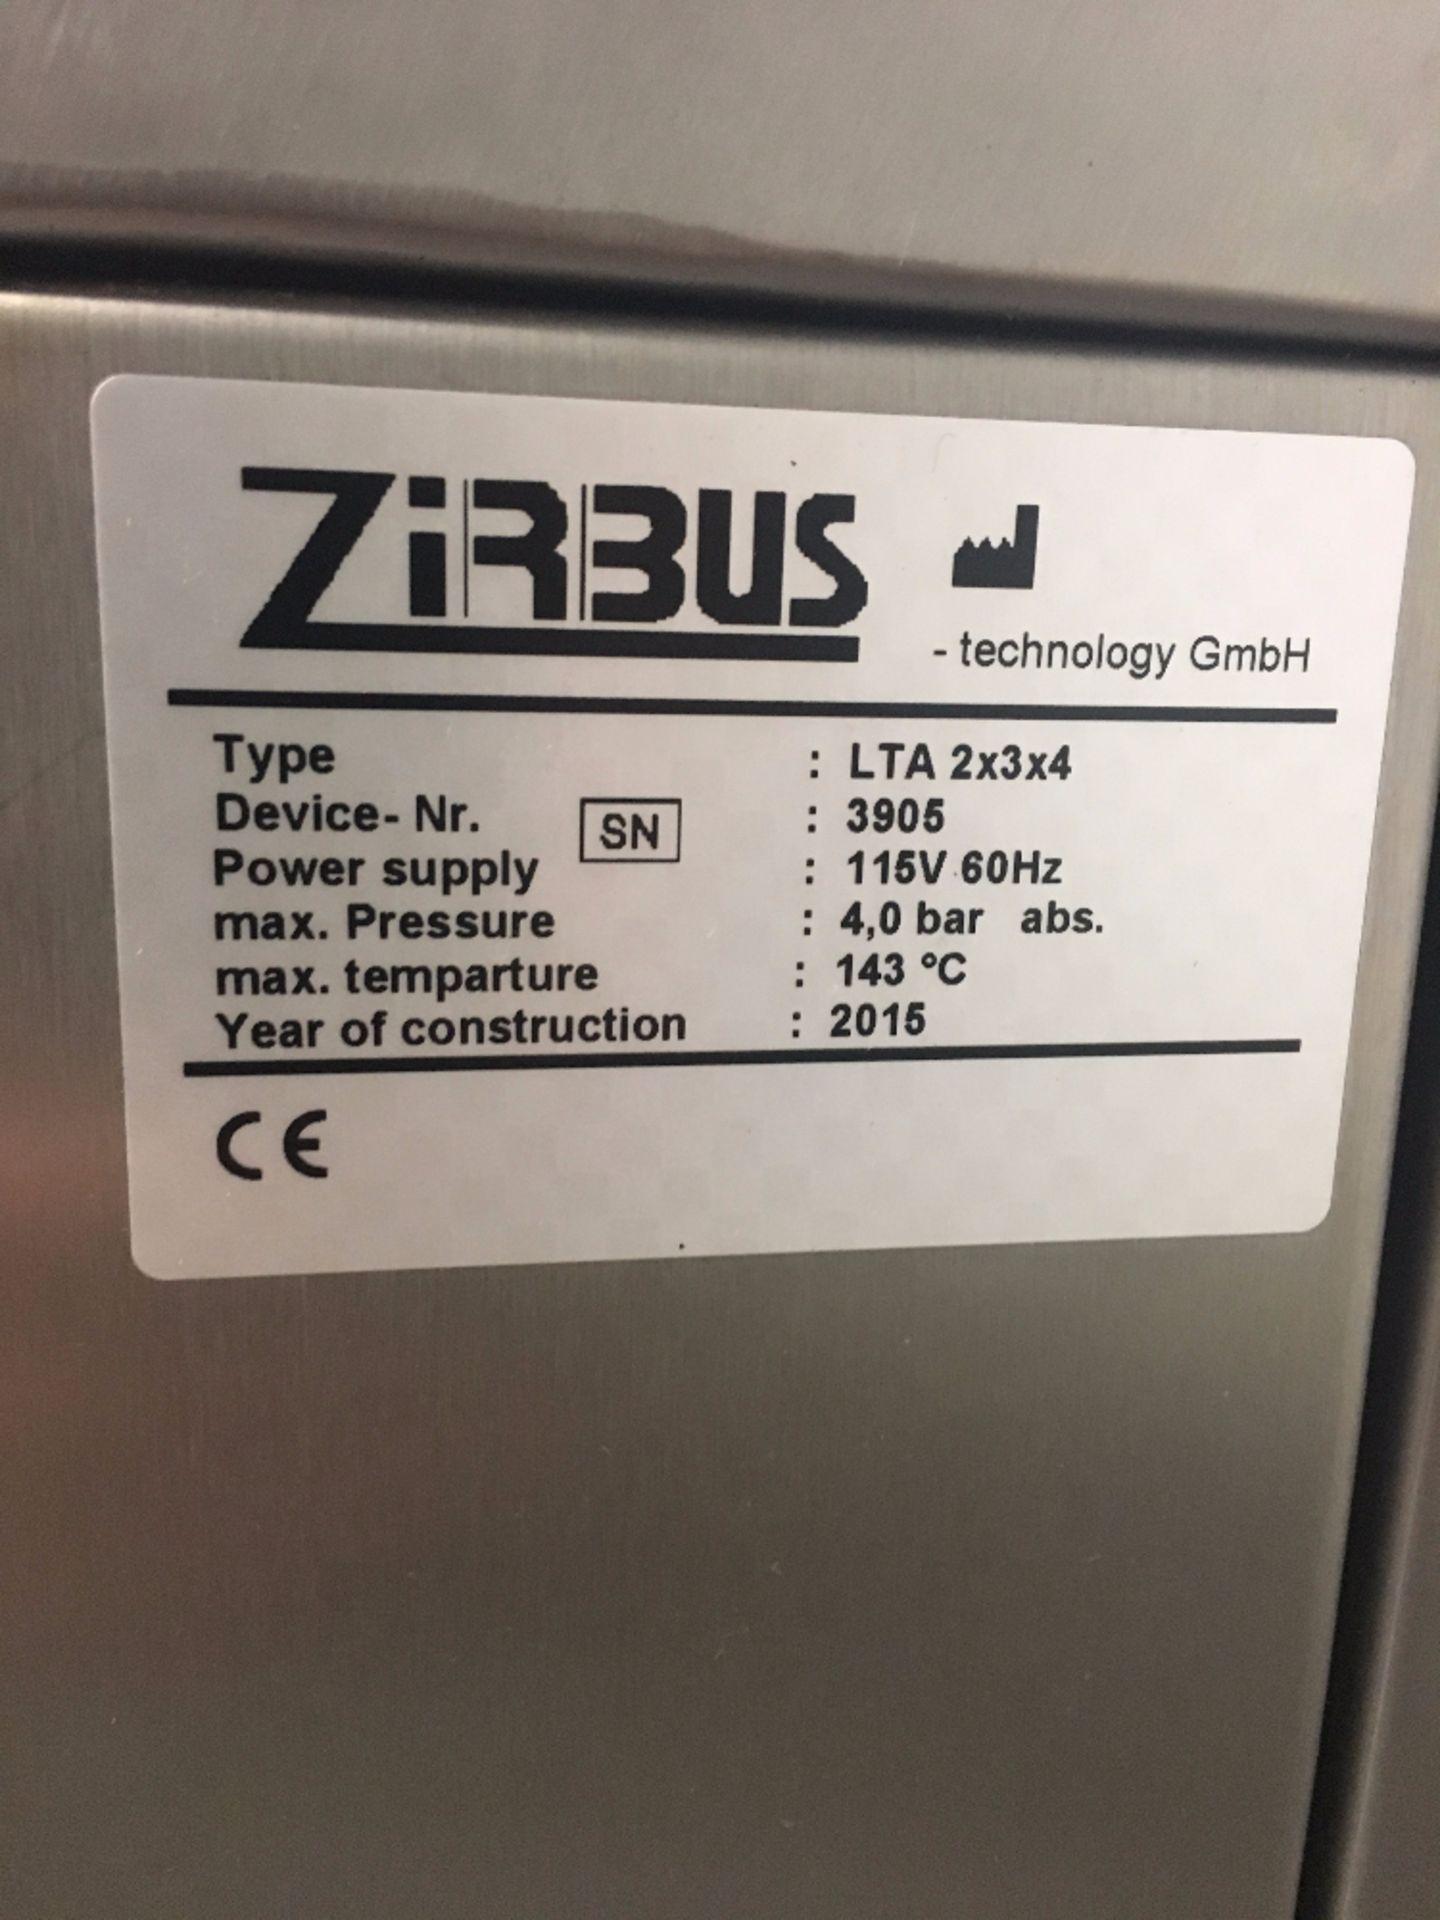 ZirBus LTA 2x3x4 Laboratory Tabletop Autoclave - Image 4 of 4